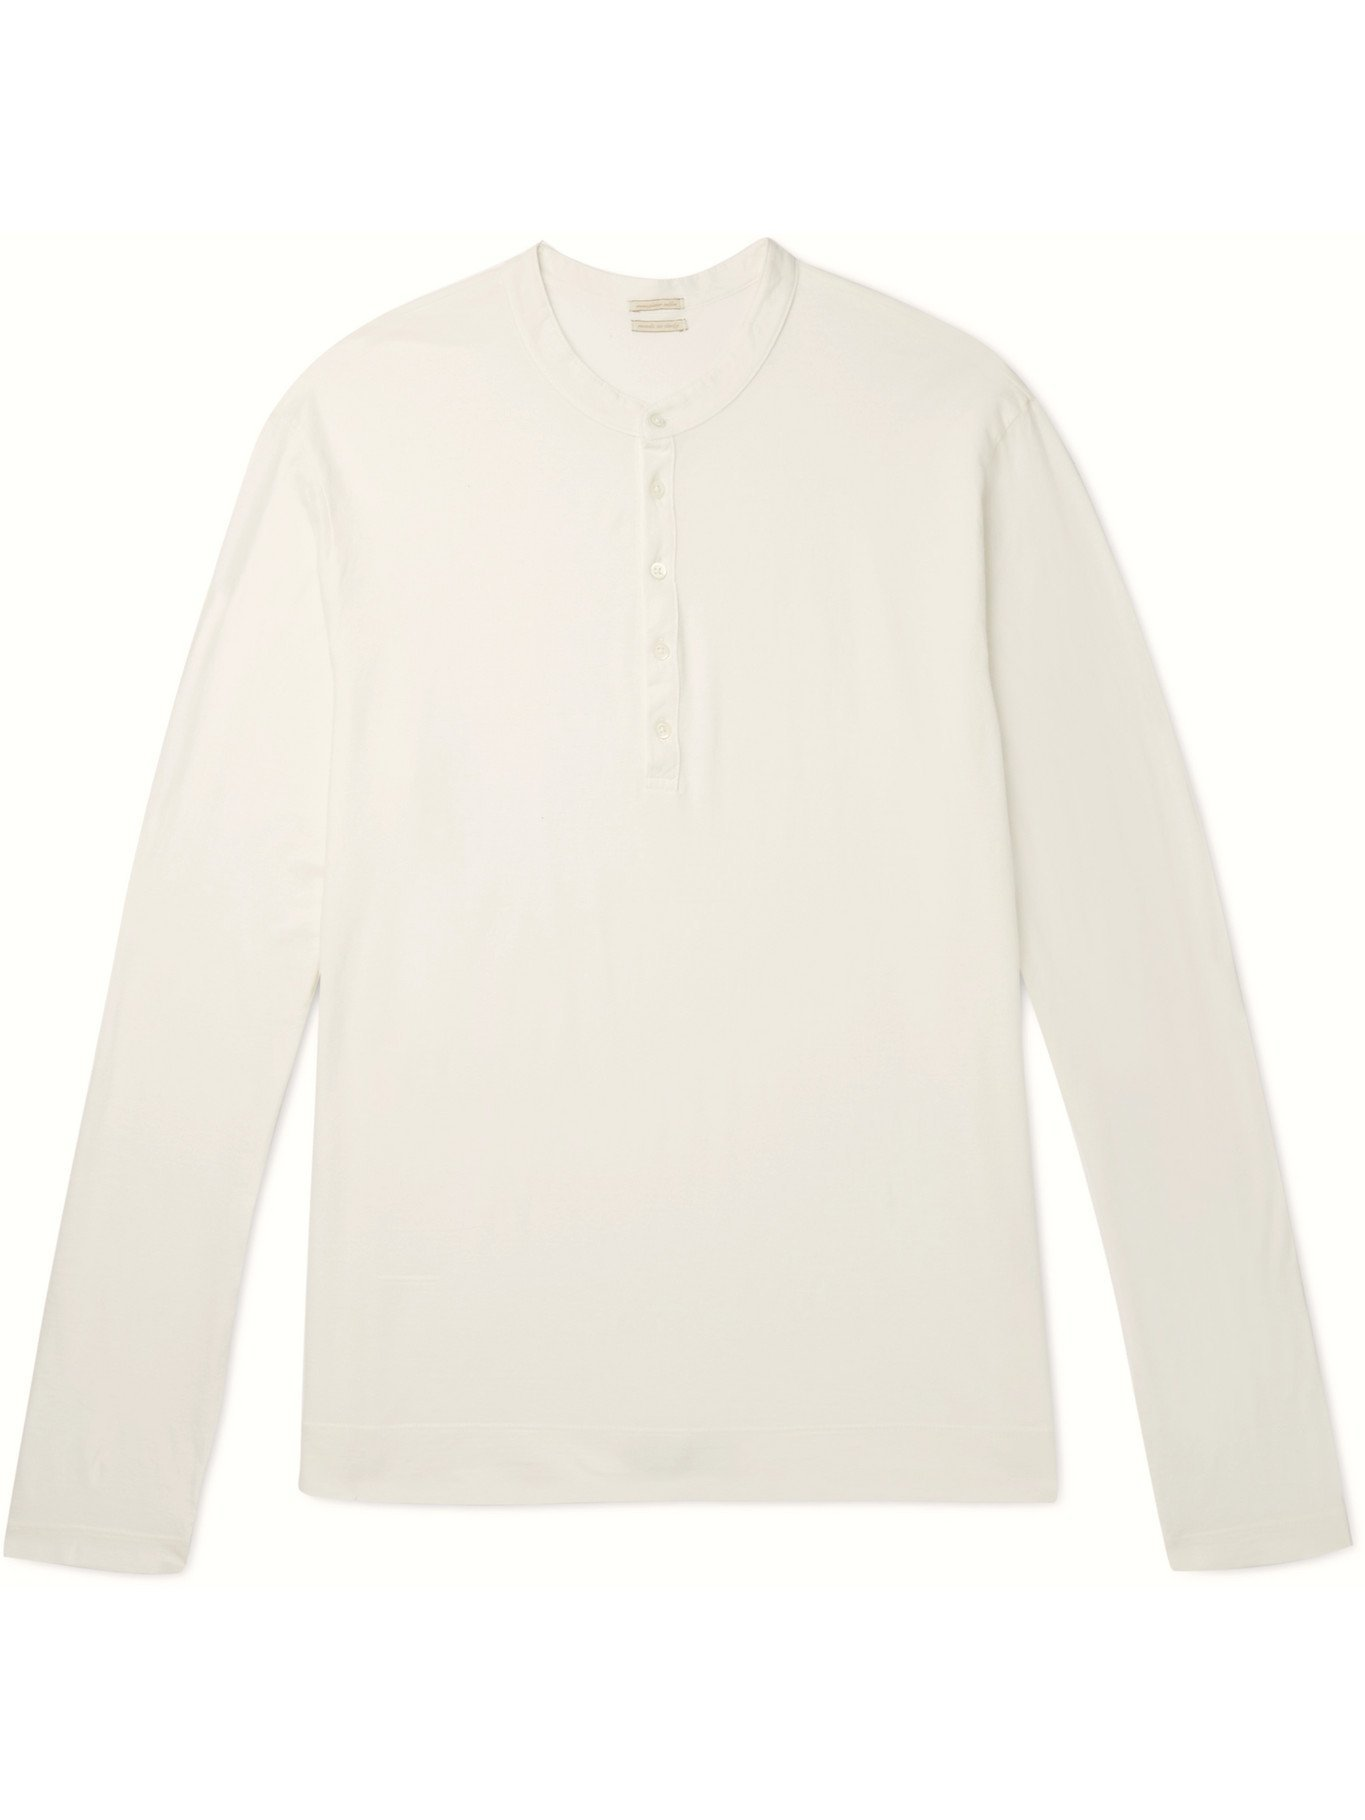 Photo: MASSIMO ALBA - Hawai Watercolour-Dyed Cotton-Jersey Henley T-Shirt - White - S